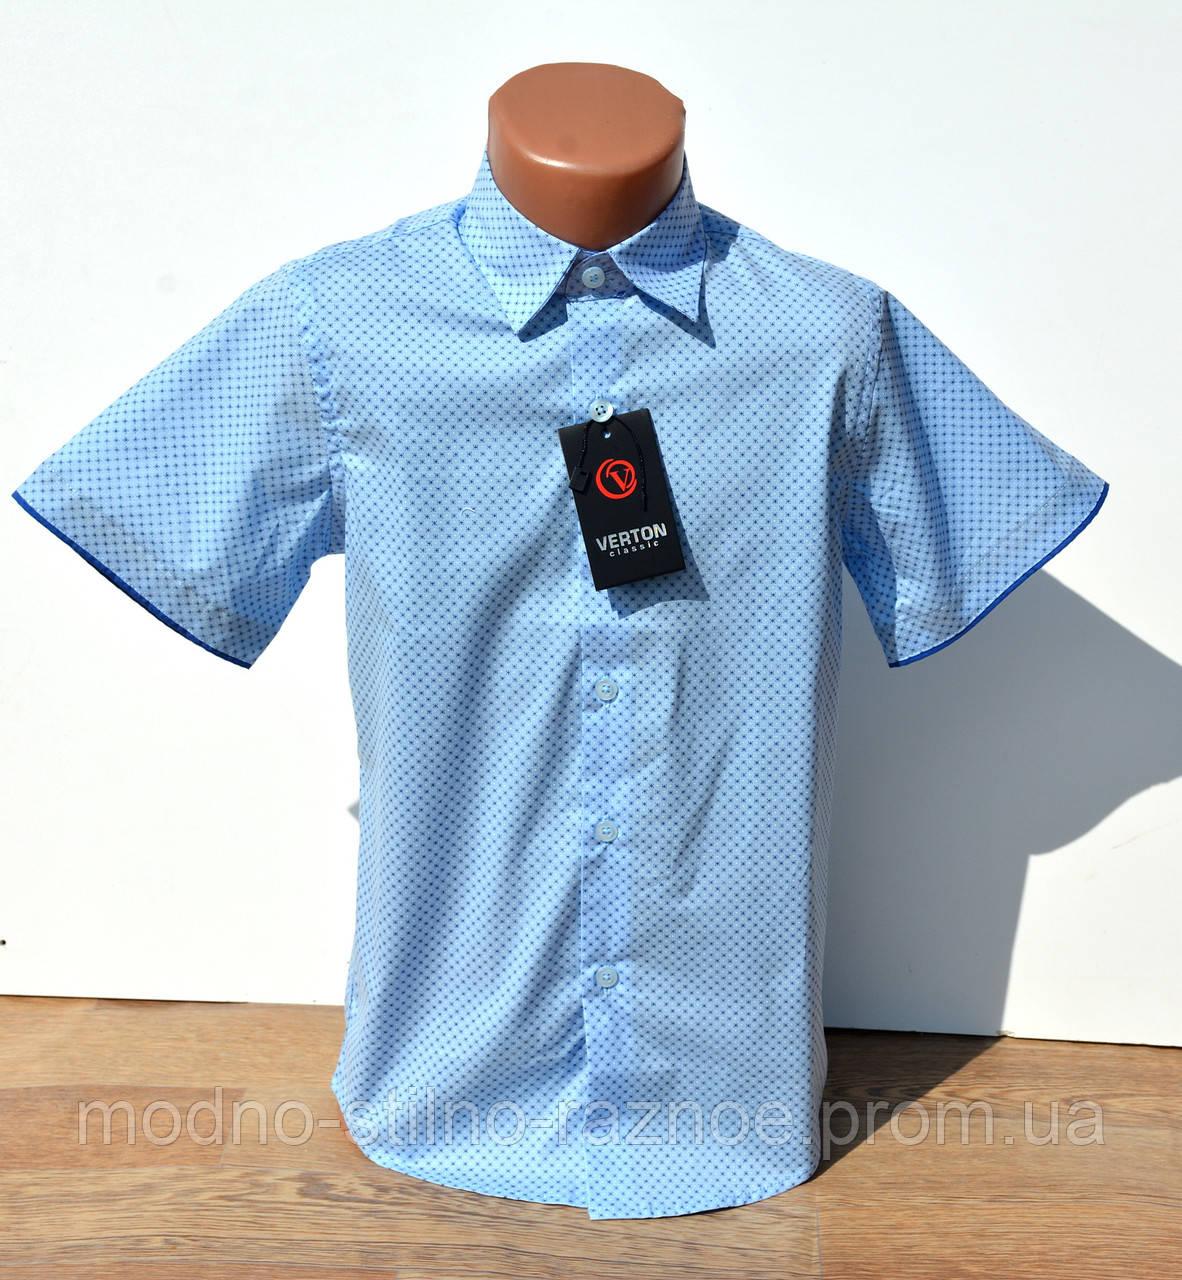 Рубашка шведка на мальчика. Короткий рукав. 6-13 лет нарядная